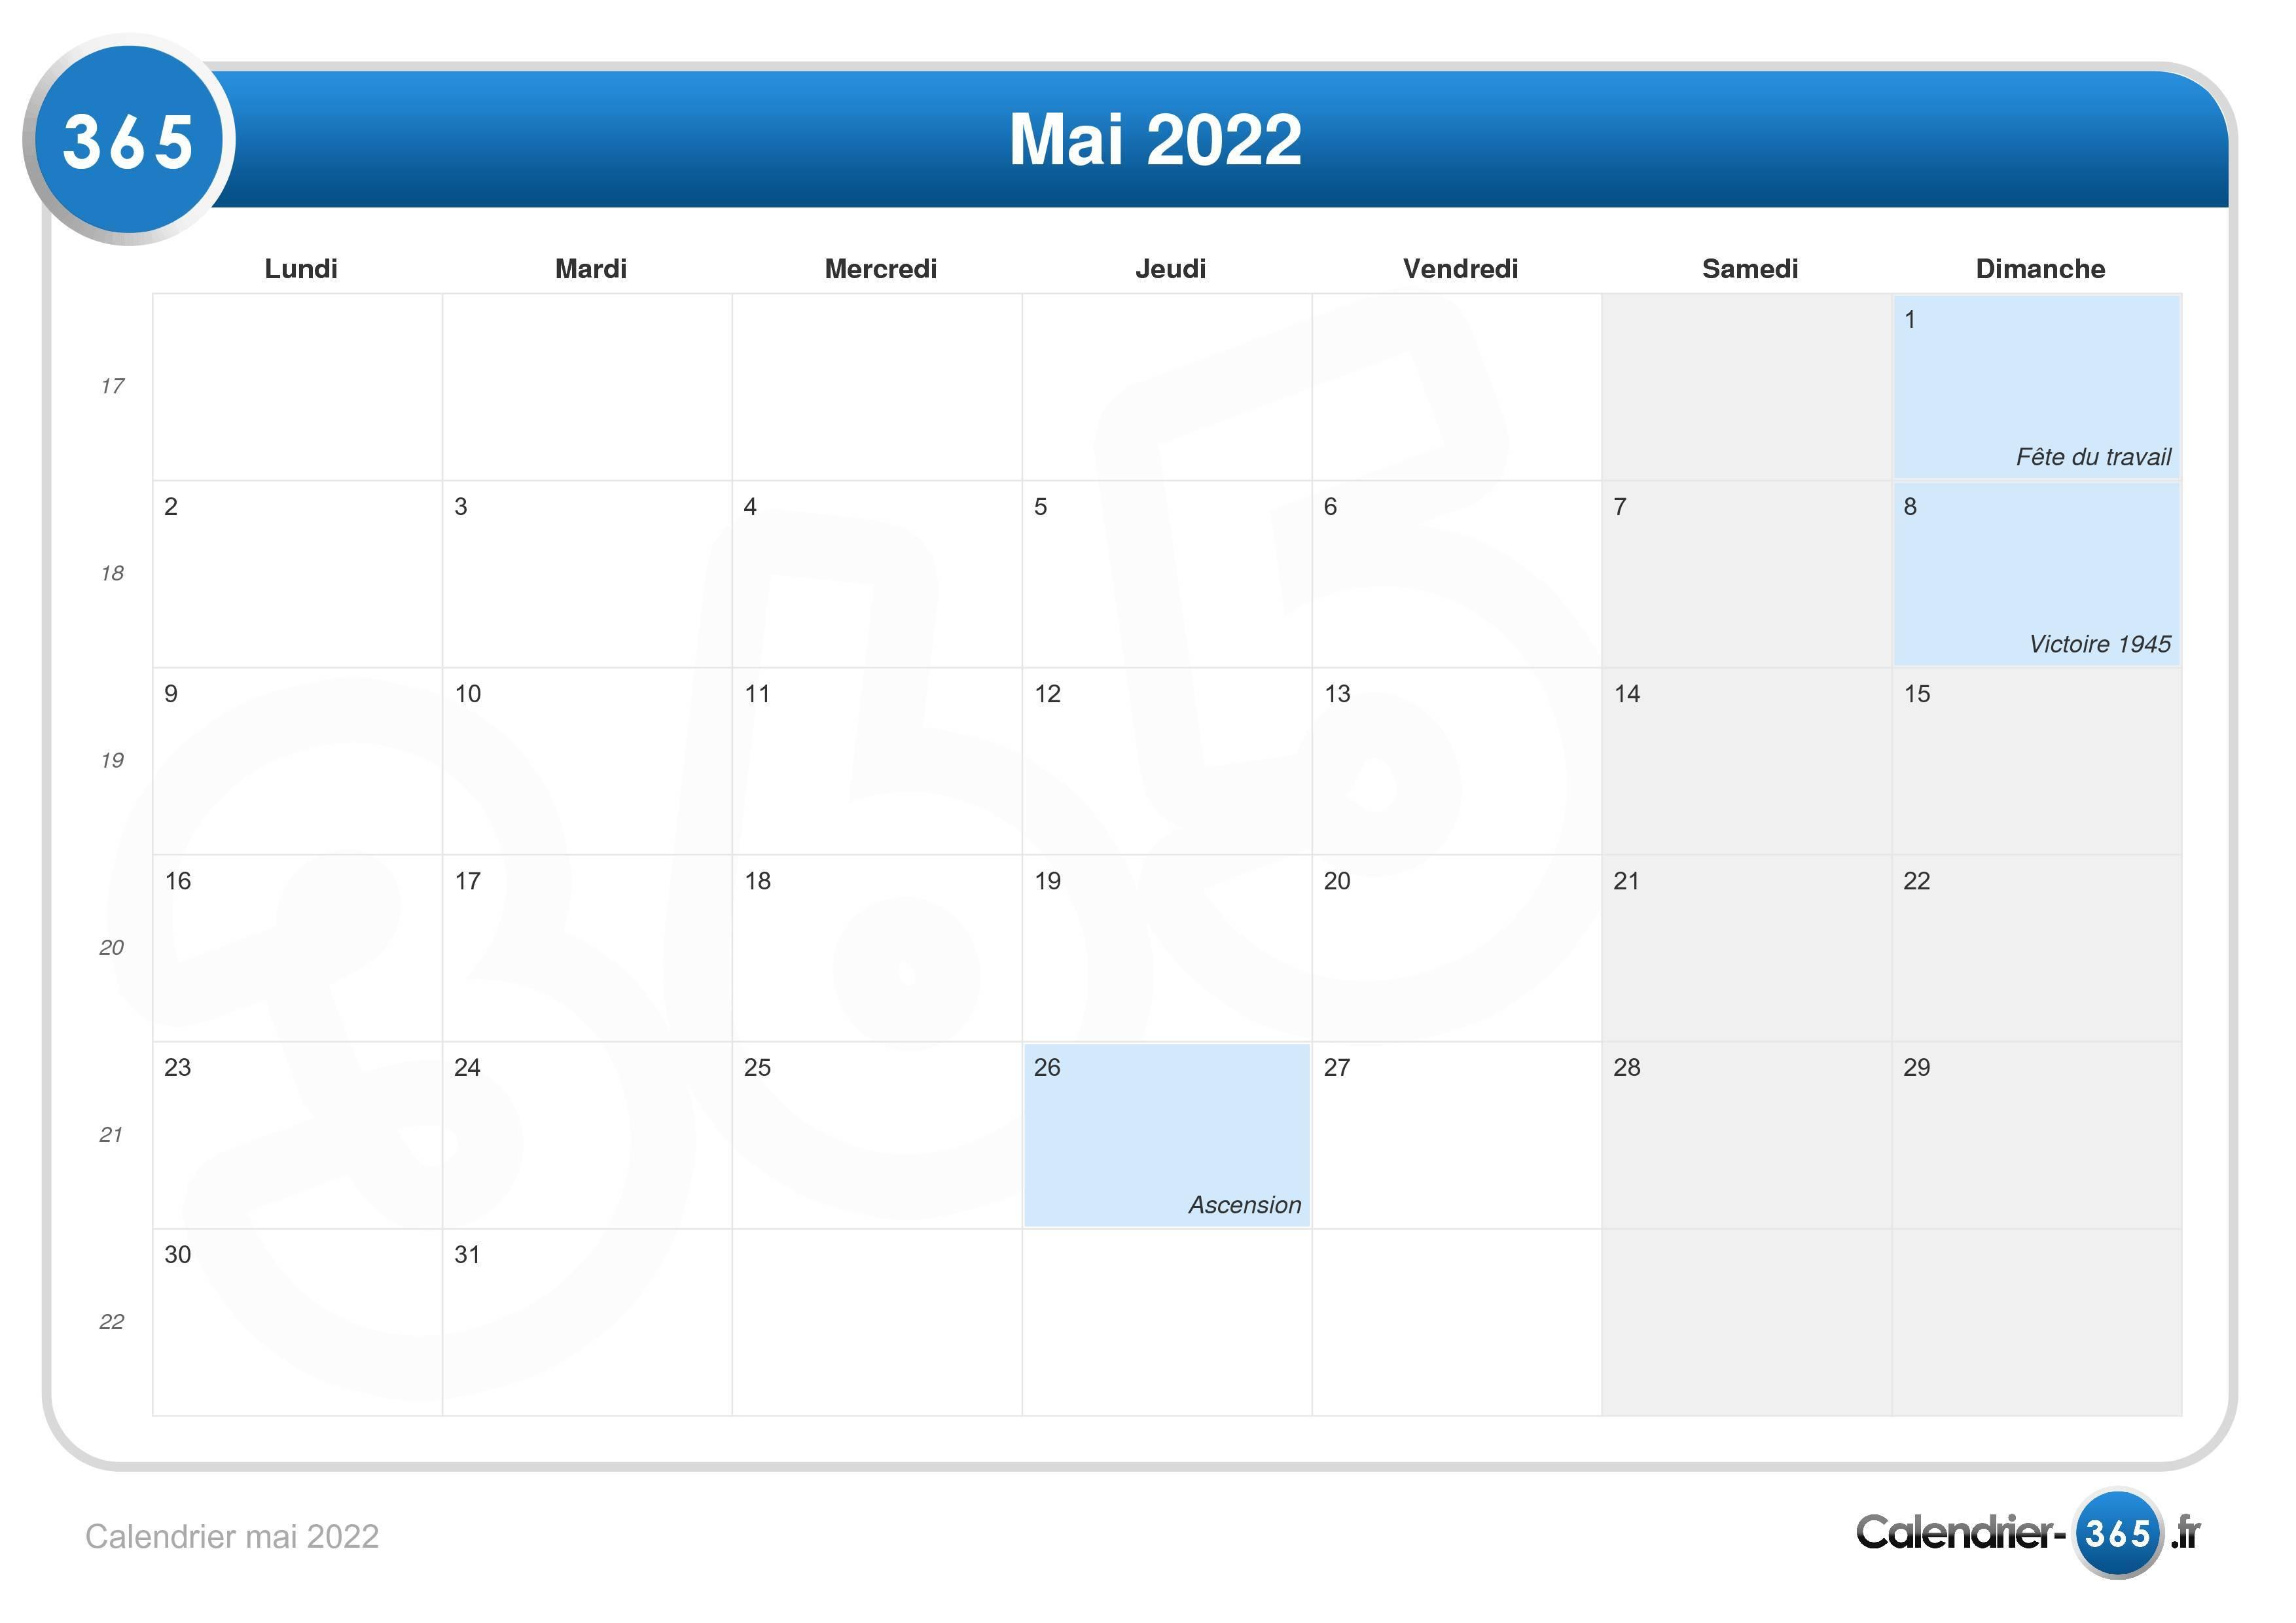 Mai Calendrier 2022 Calendrier mai 2022